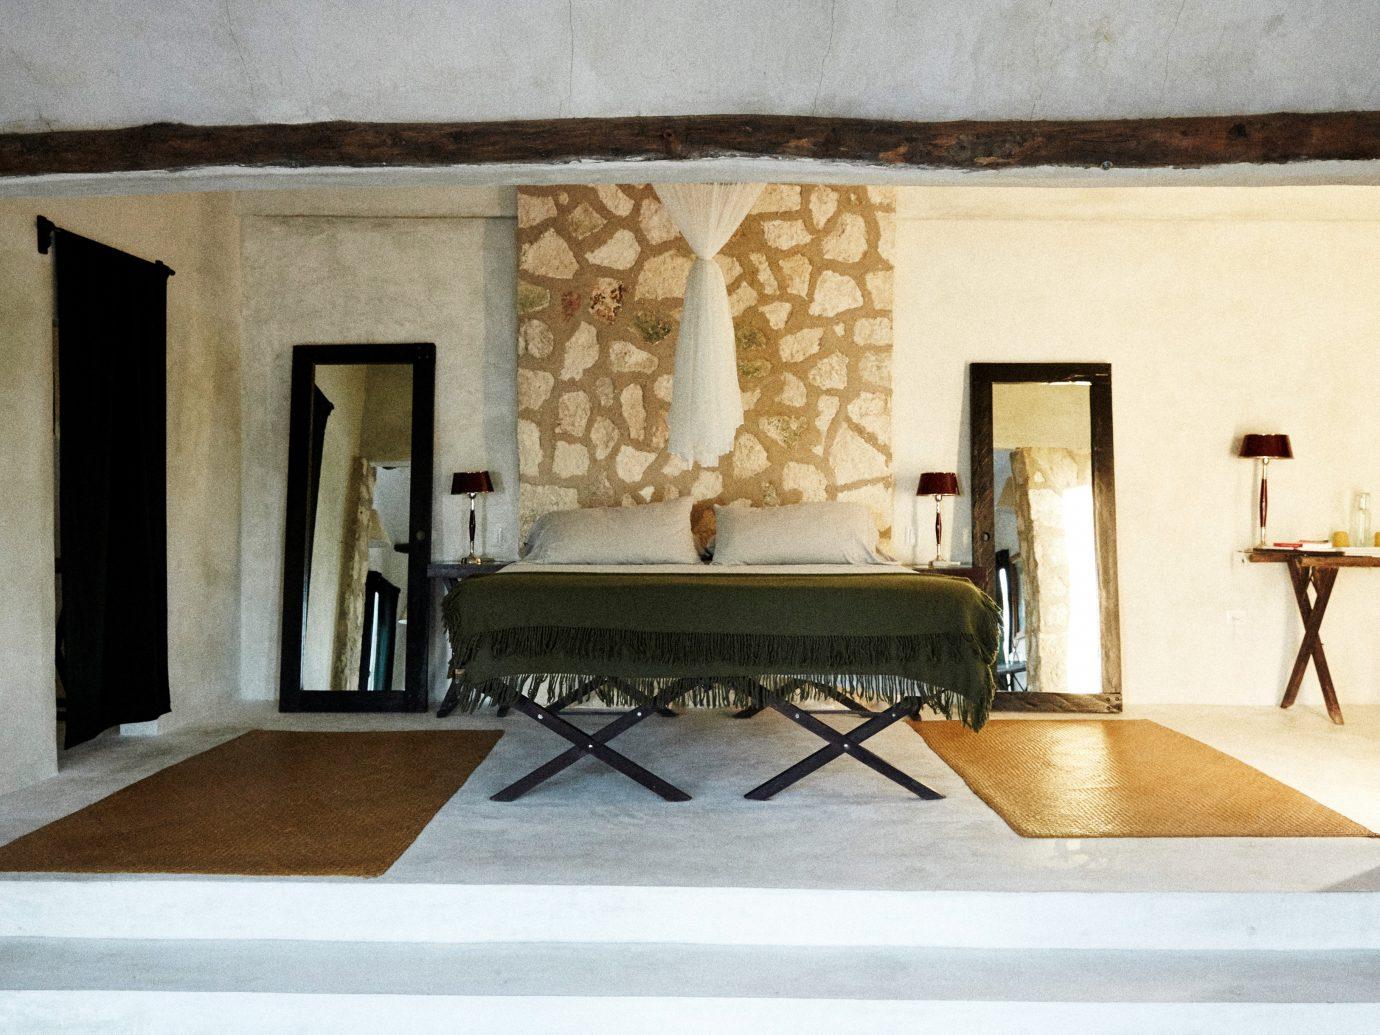 Bedroom at Coqui Coqui, Merida